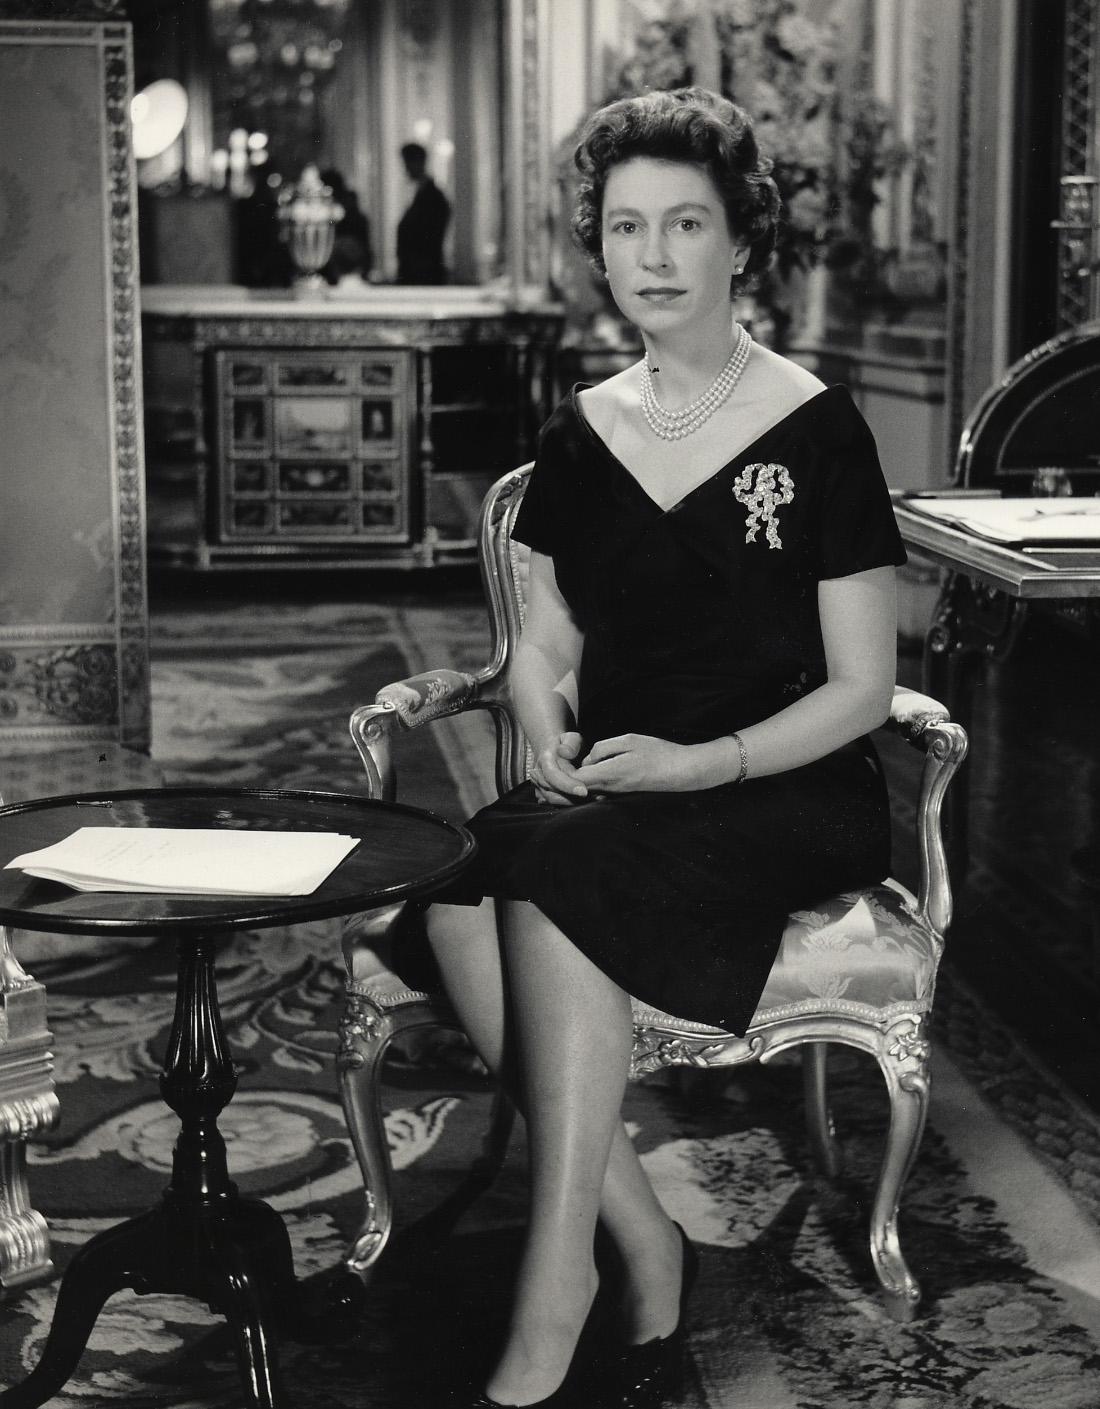 QE2 1960 - Royal Wedding Televised